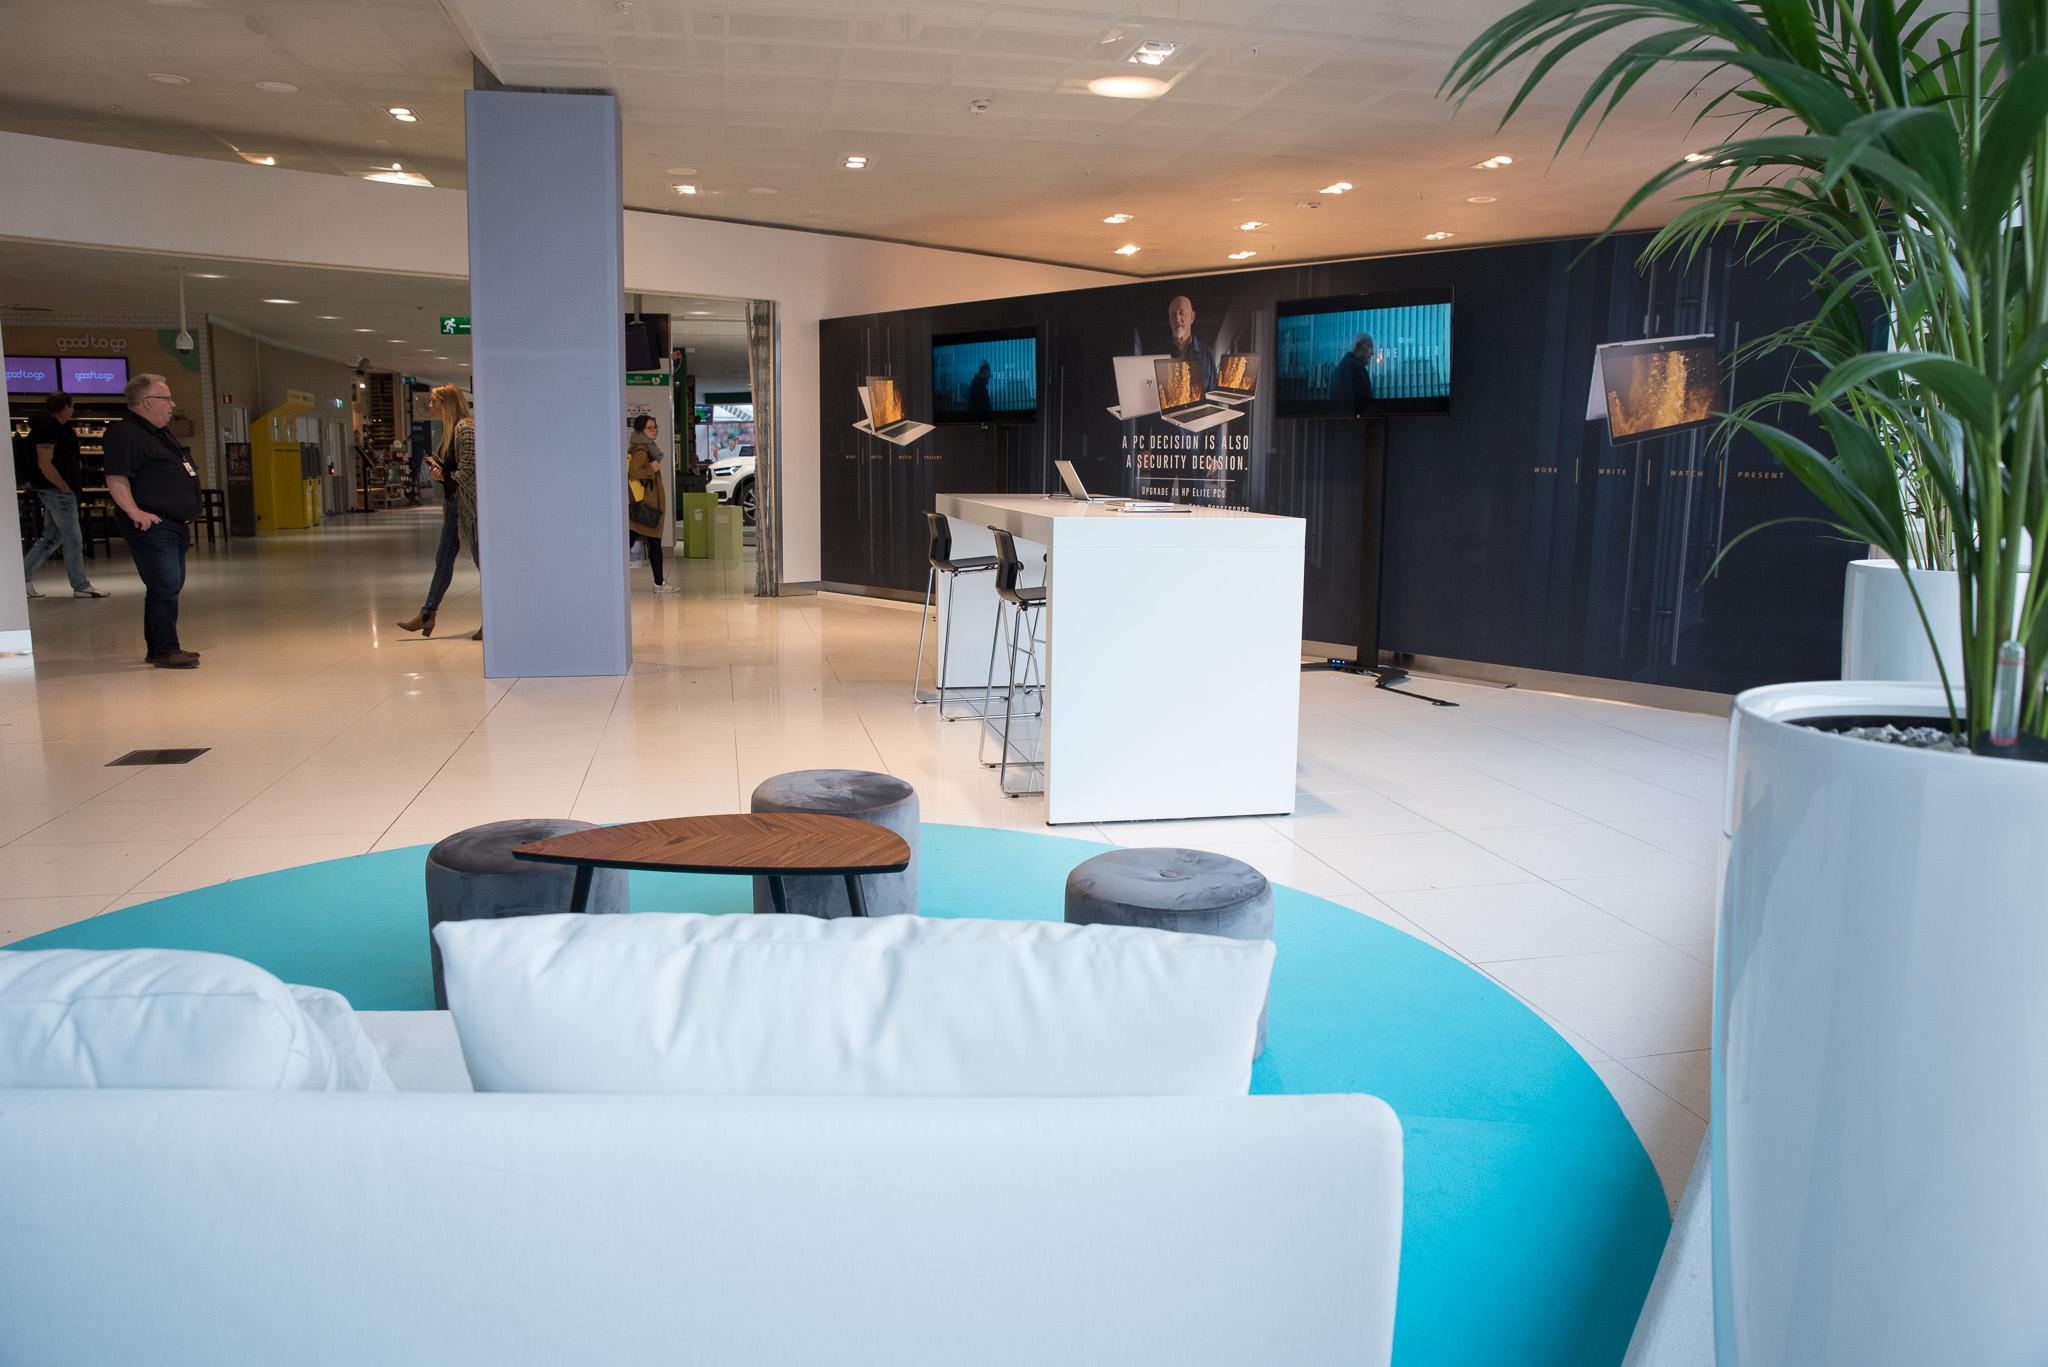 Pop Up Yta HP Landvetter Airport Swedavia Photography Annika Lagerqvist www.annikasomething.com